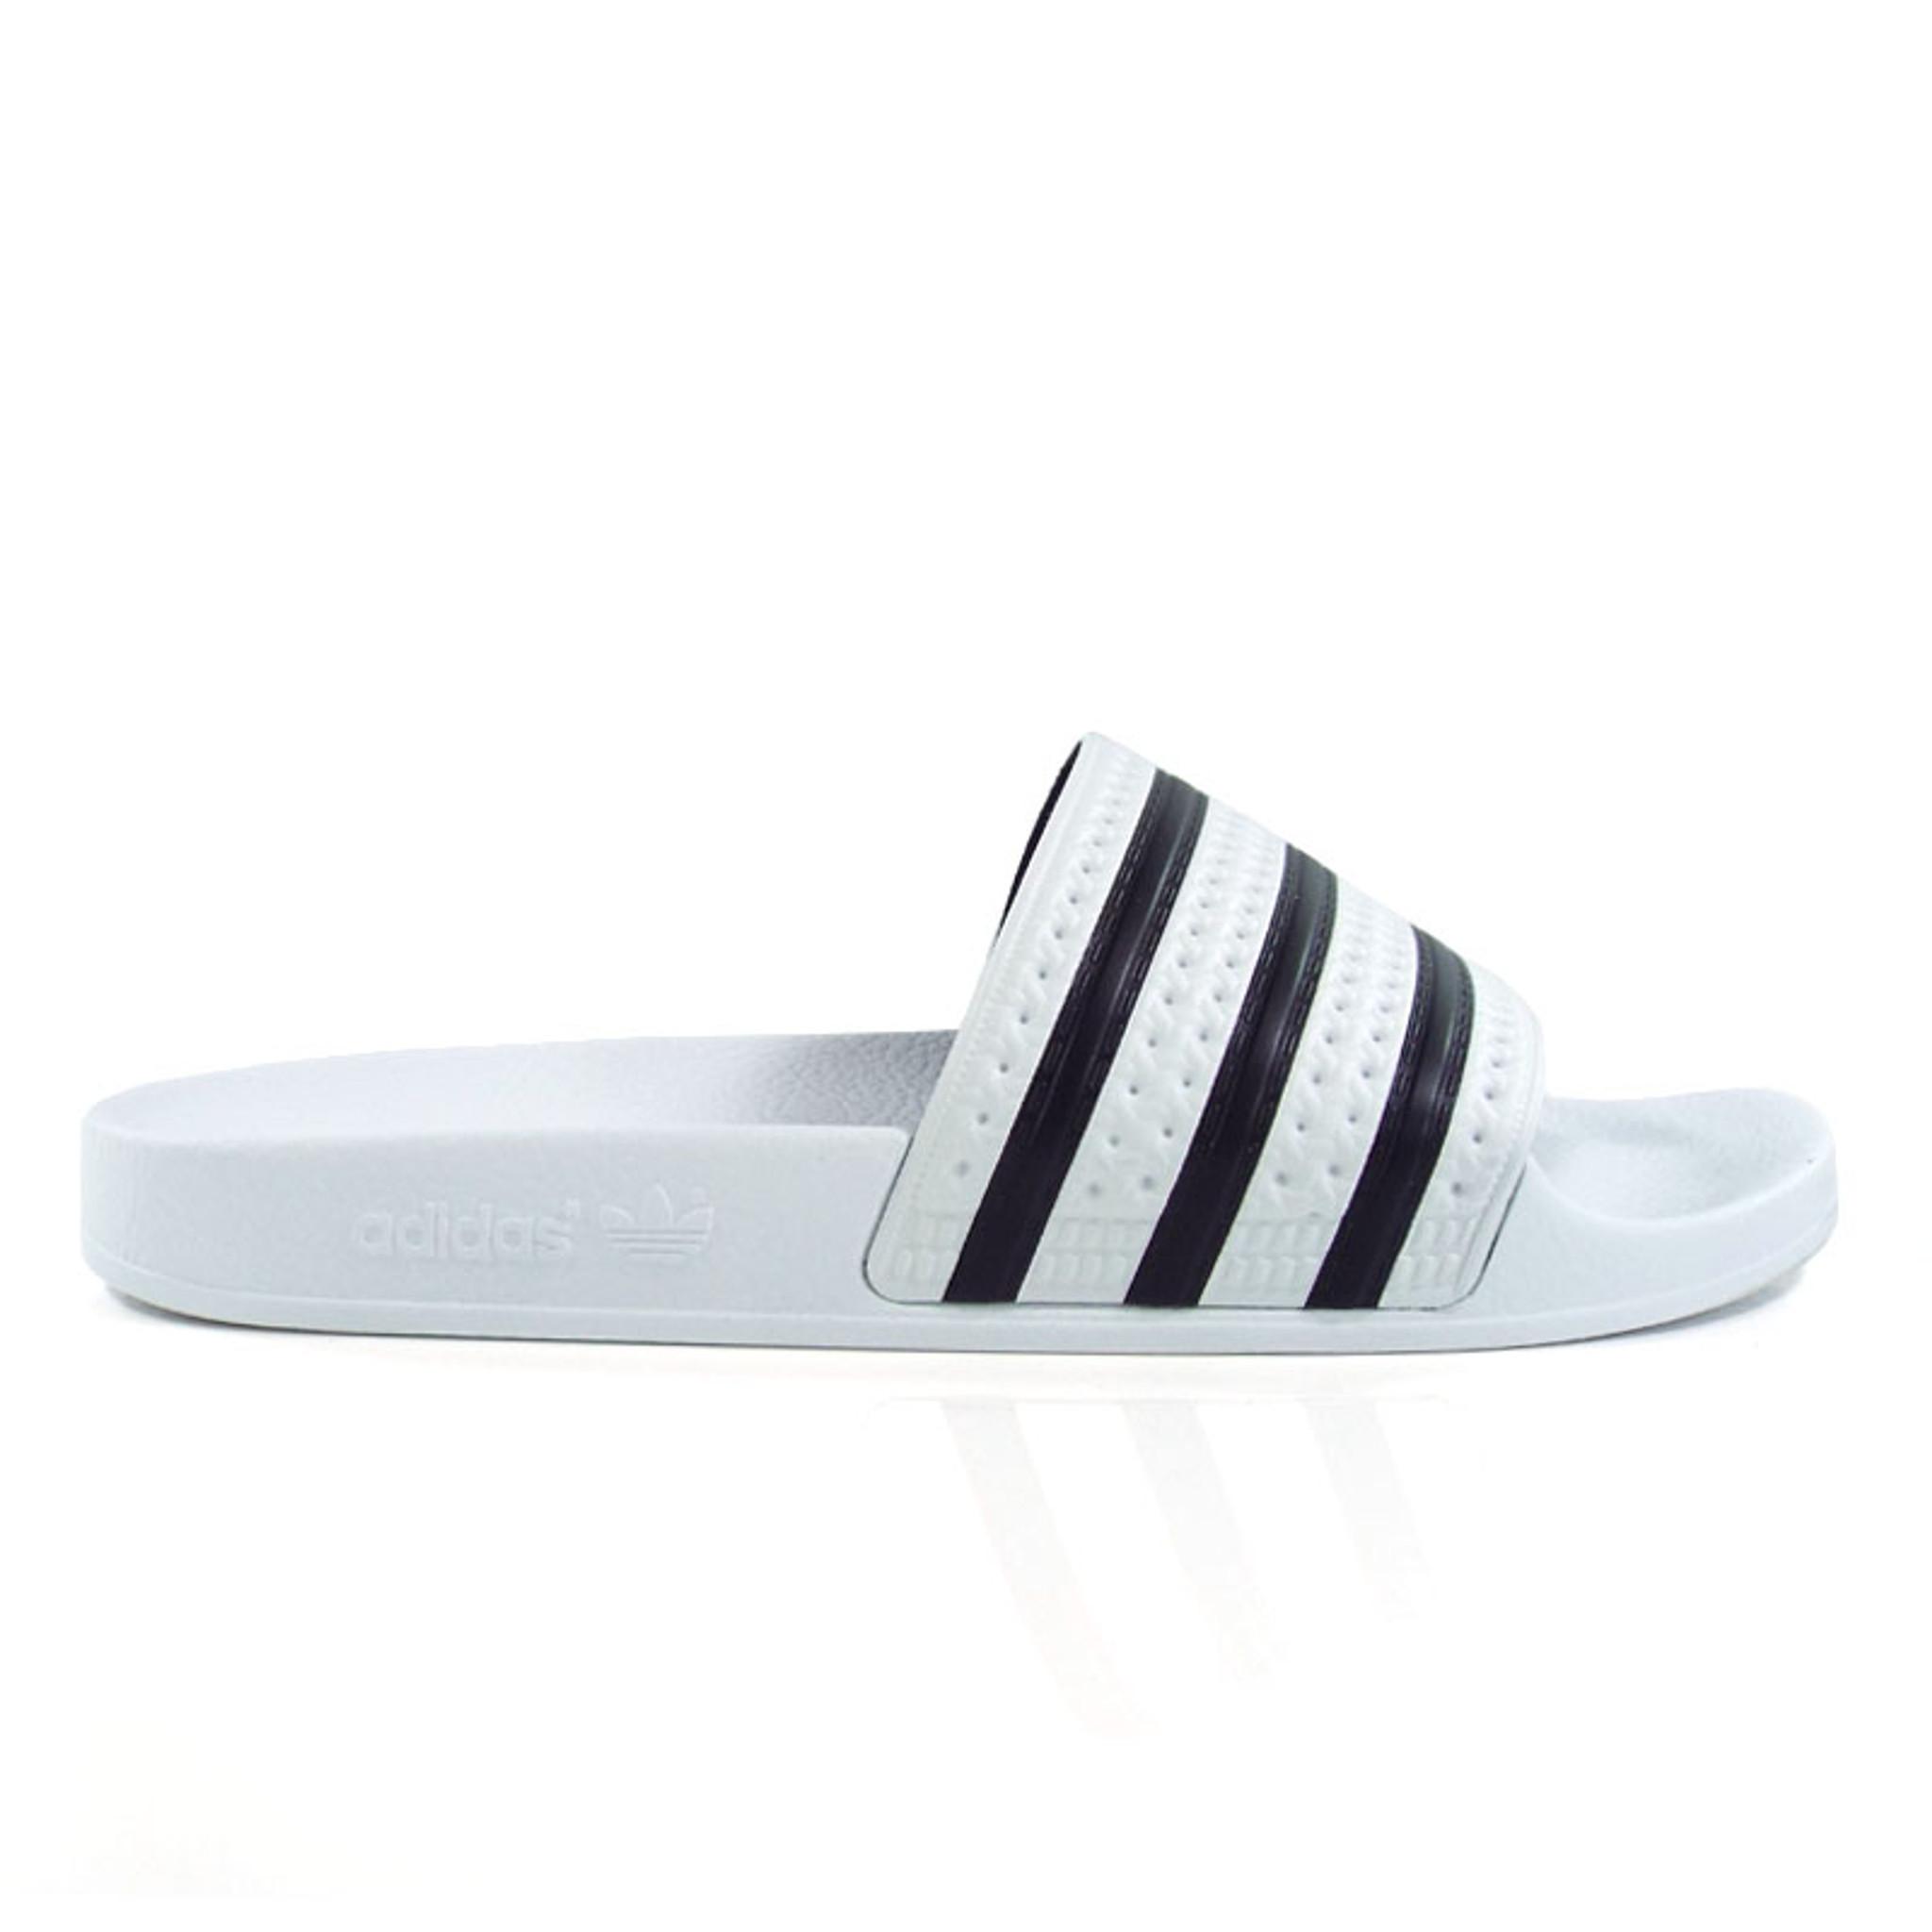 3ddf0fd282f Adidas Originals Adilette Slides - White Black - Detroit City ...